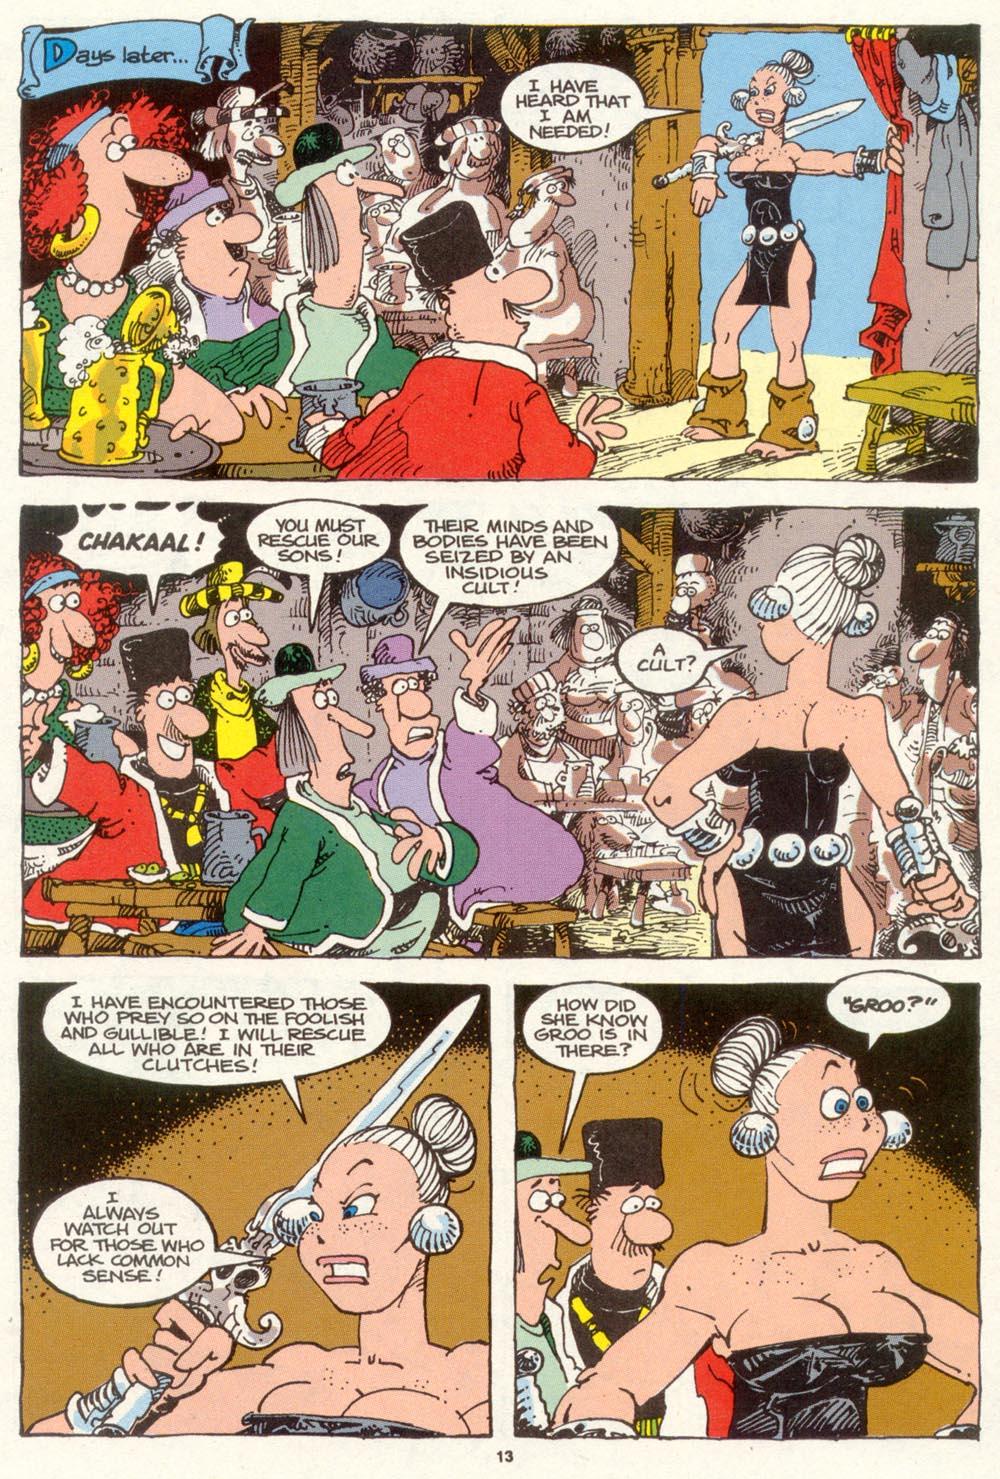 Read online Sergio Aragonés Groo the Wanderer comic -  Issue #89 - 14